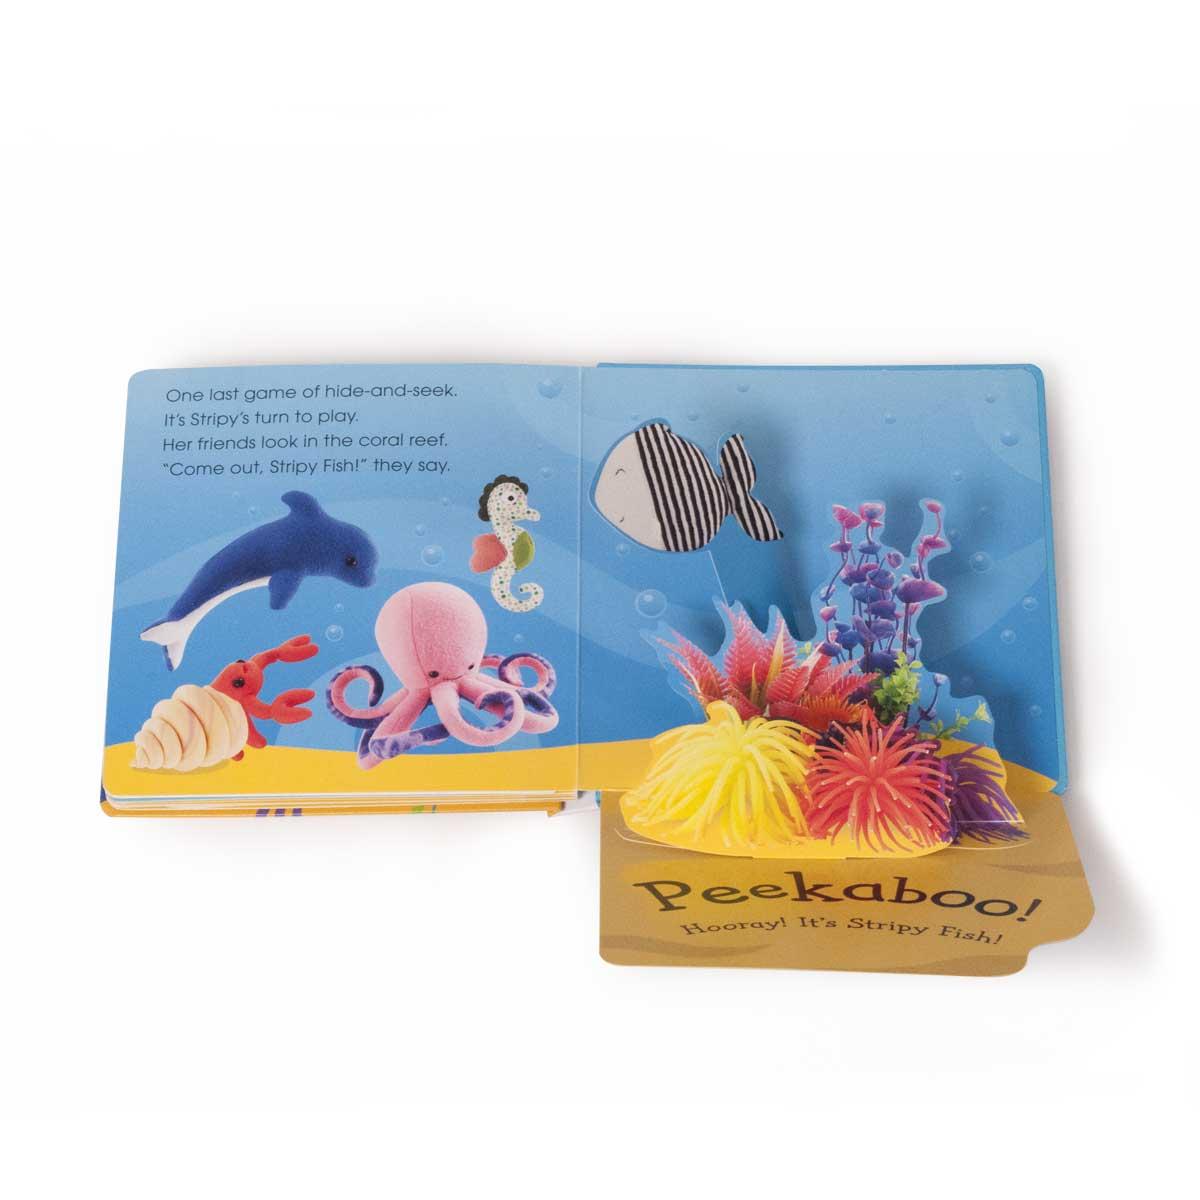 Peekaboo_Under-the-Sea_Fish_open-1200x1200.jpg